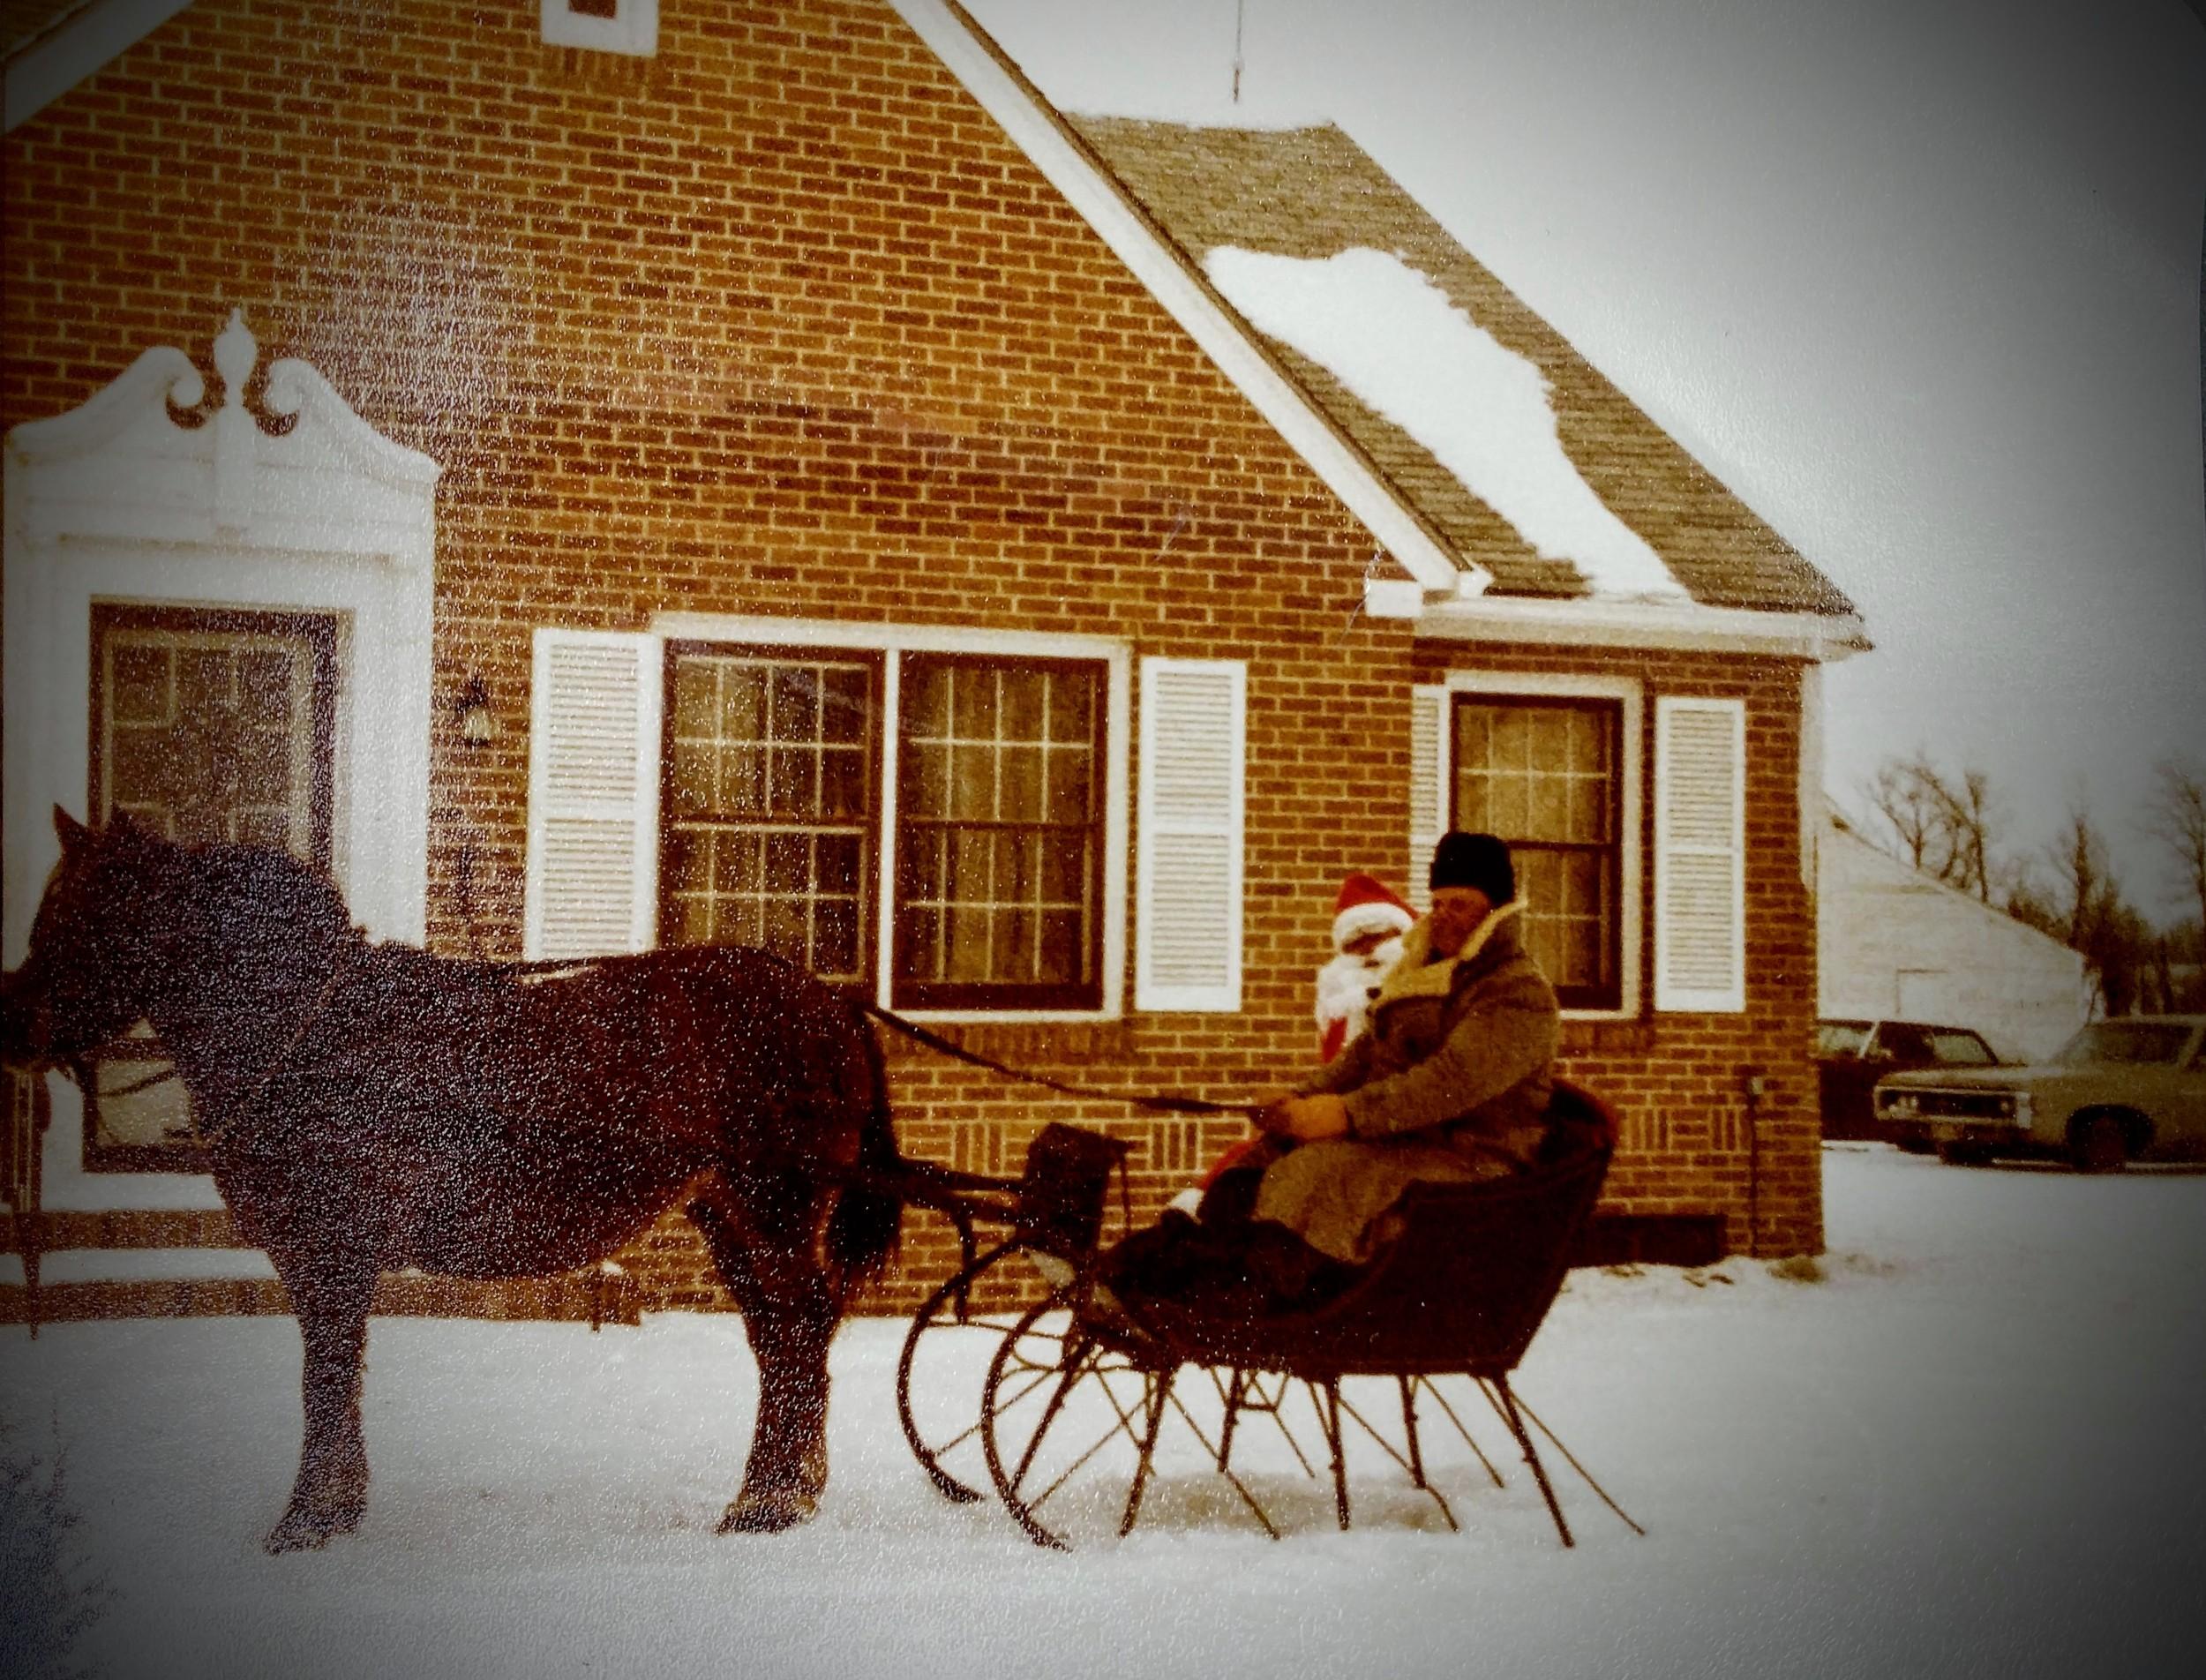 Jim and Santa when Santa's sleigh broke down.